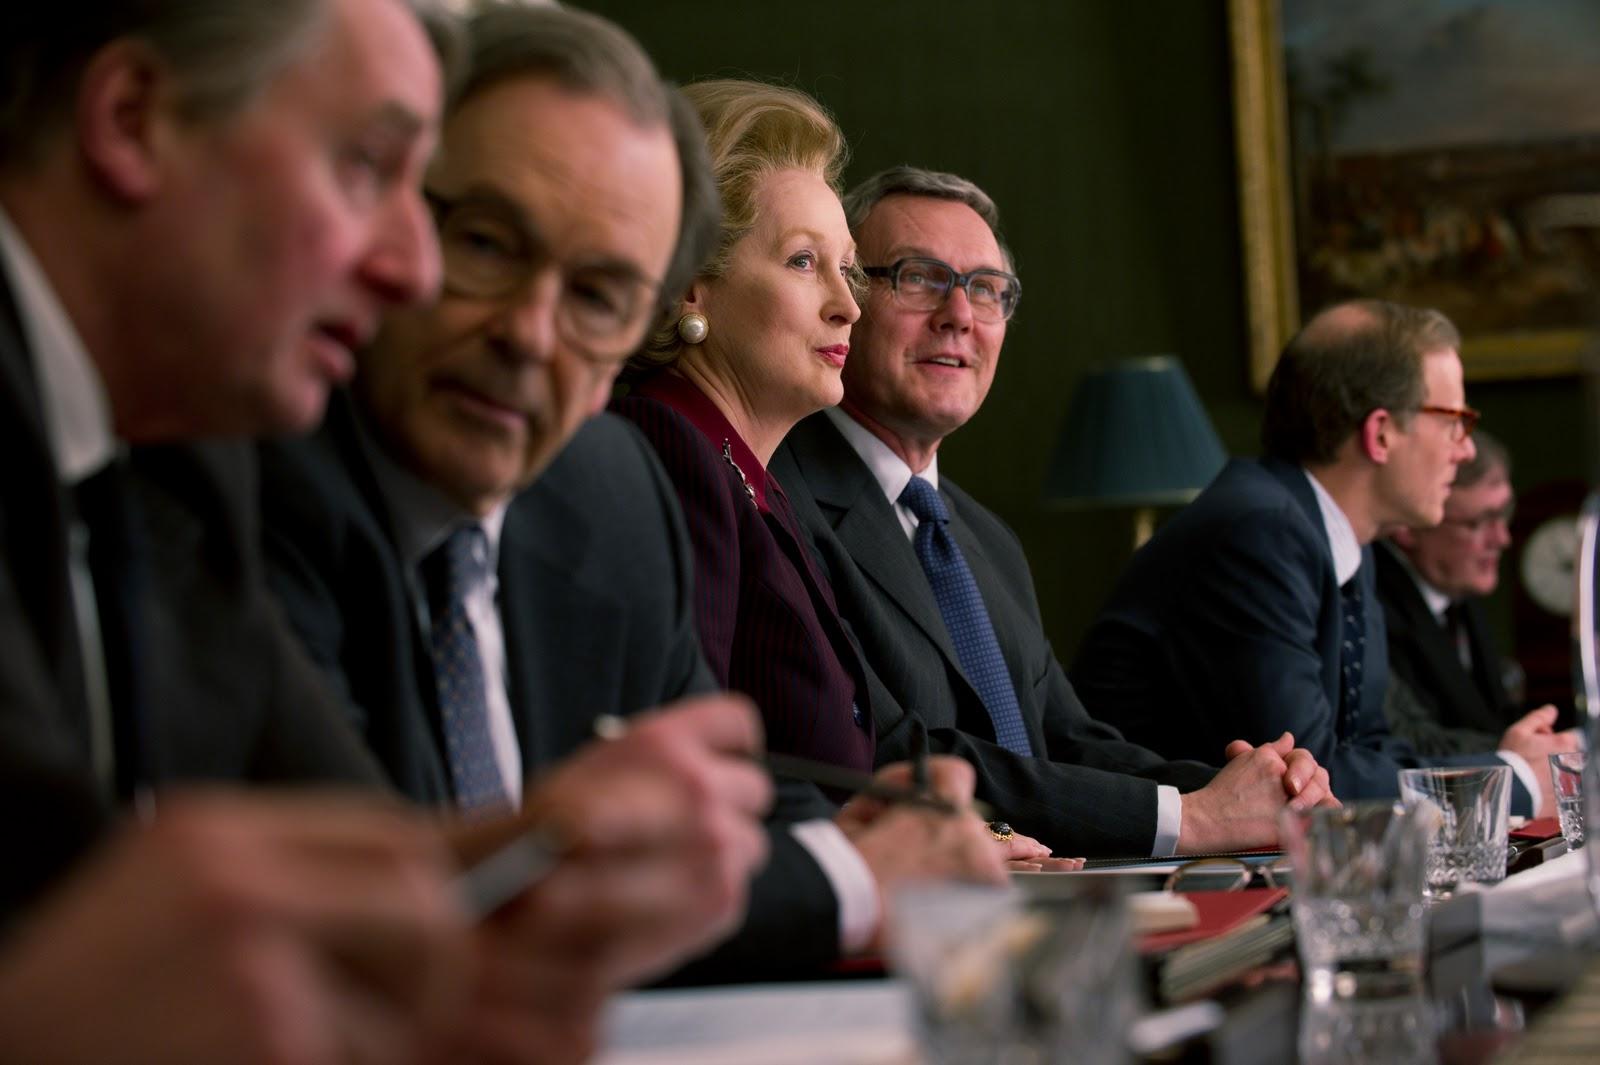 Meryl Streep en la Piel de Margaret Thatcher. Impacta.